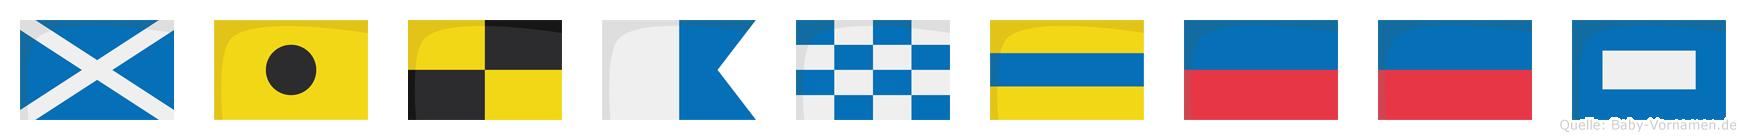 Milandeep im Flaggenalphabet